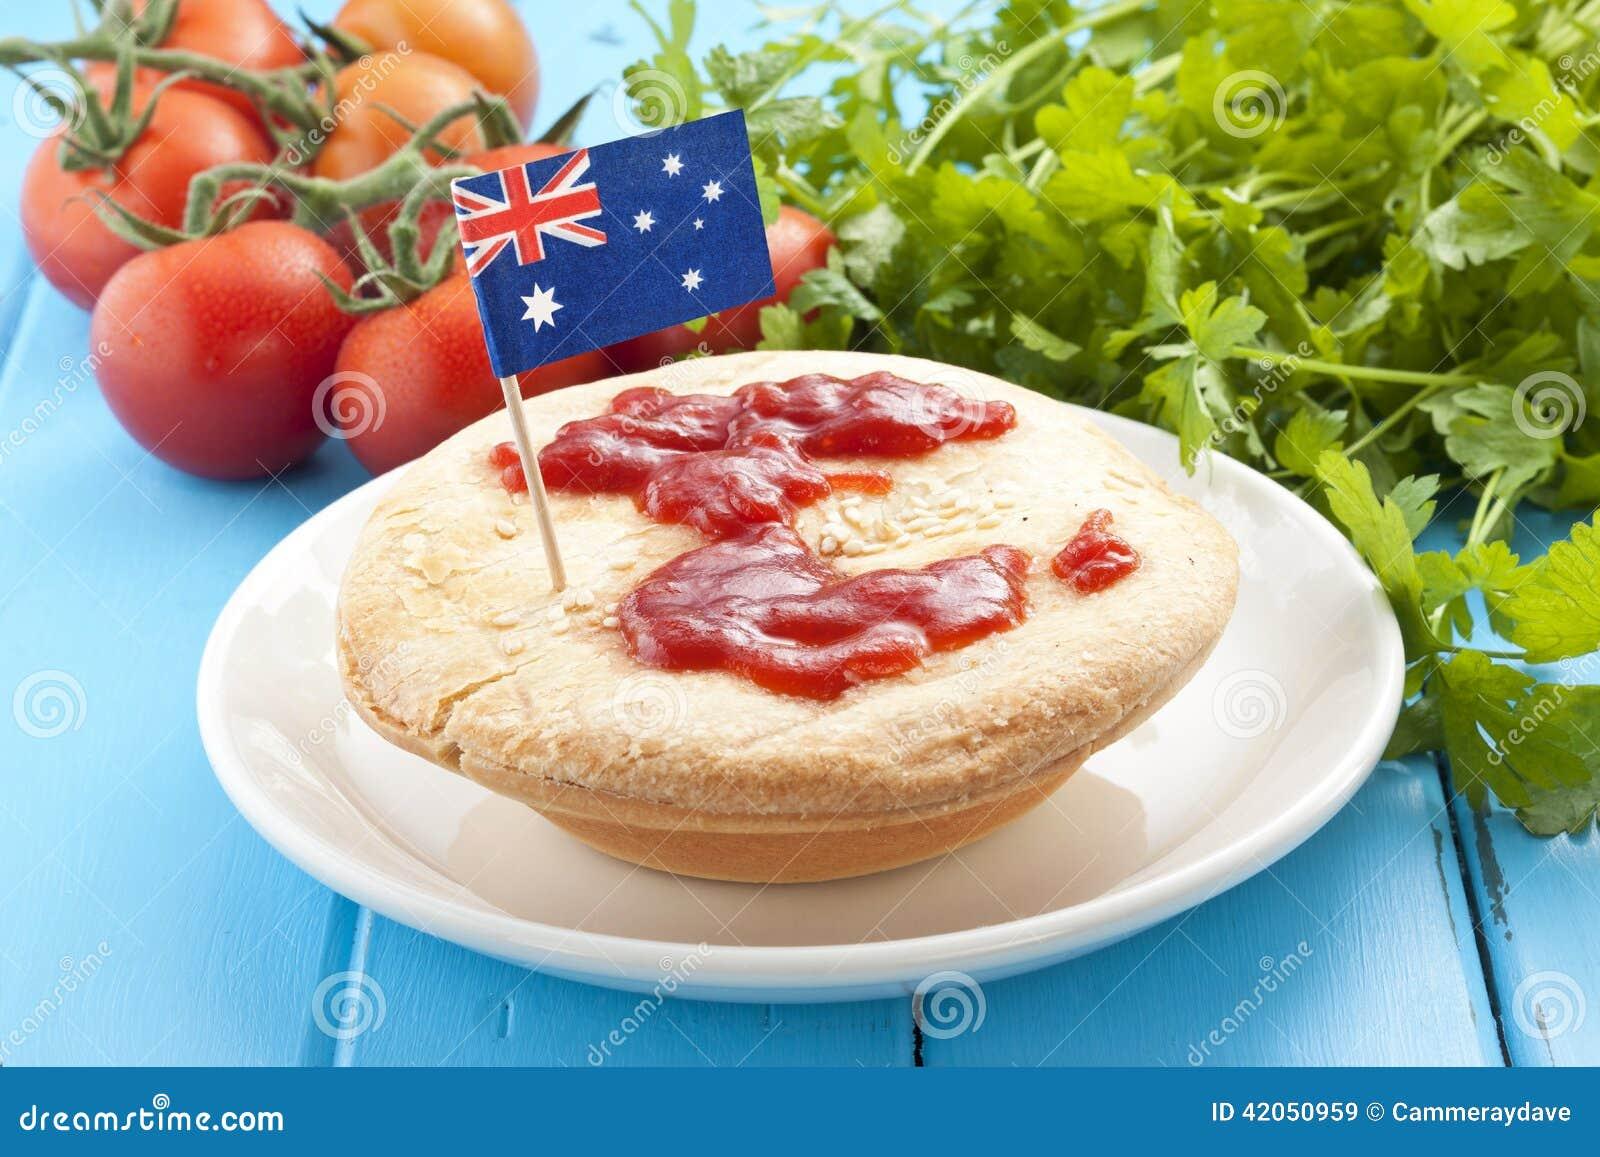 [Image: australian-meat-pie-food-classic-tomato-...050959.jpg]